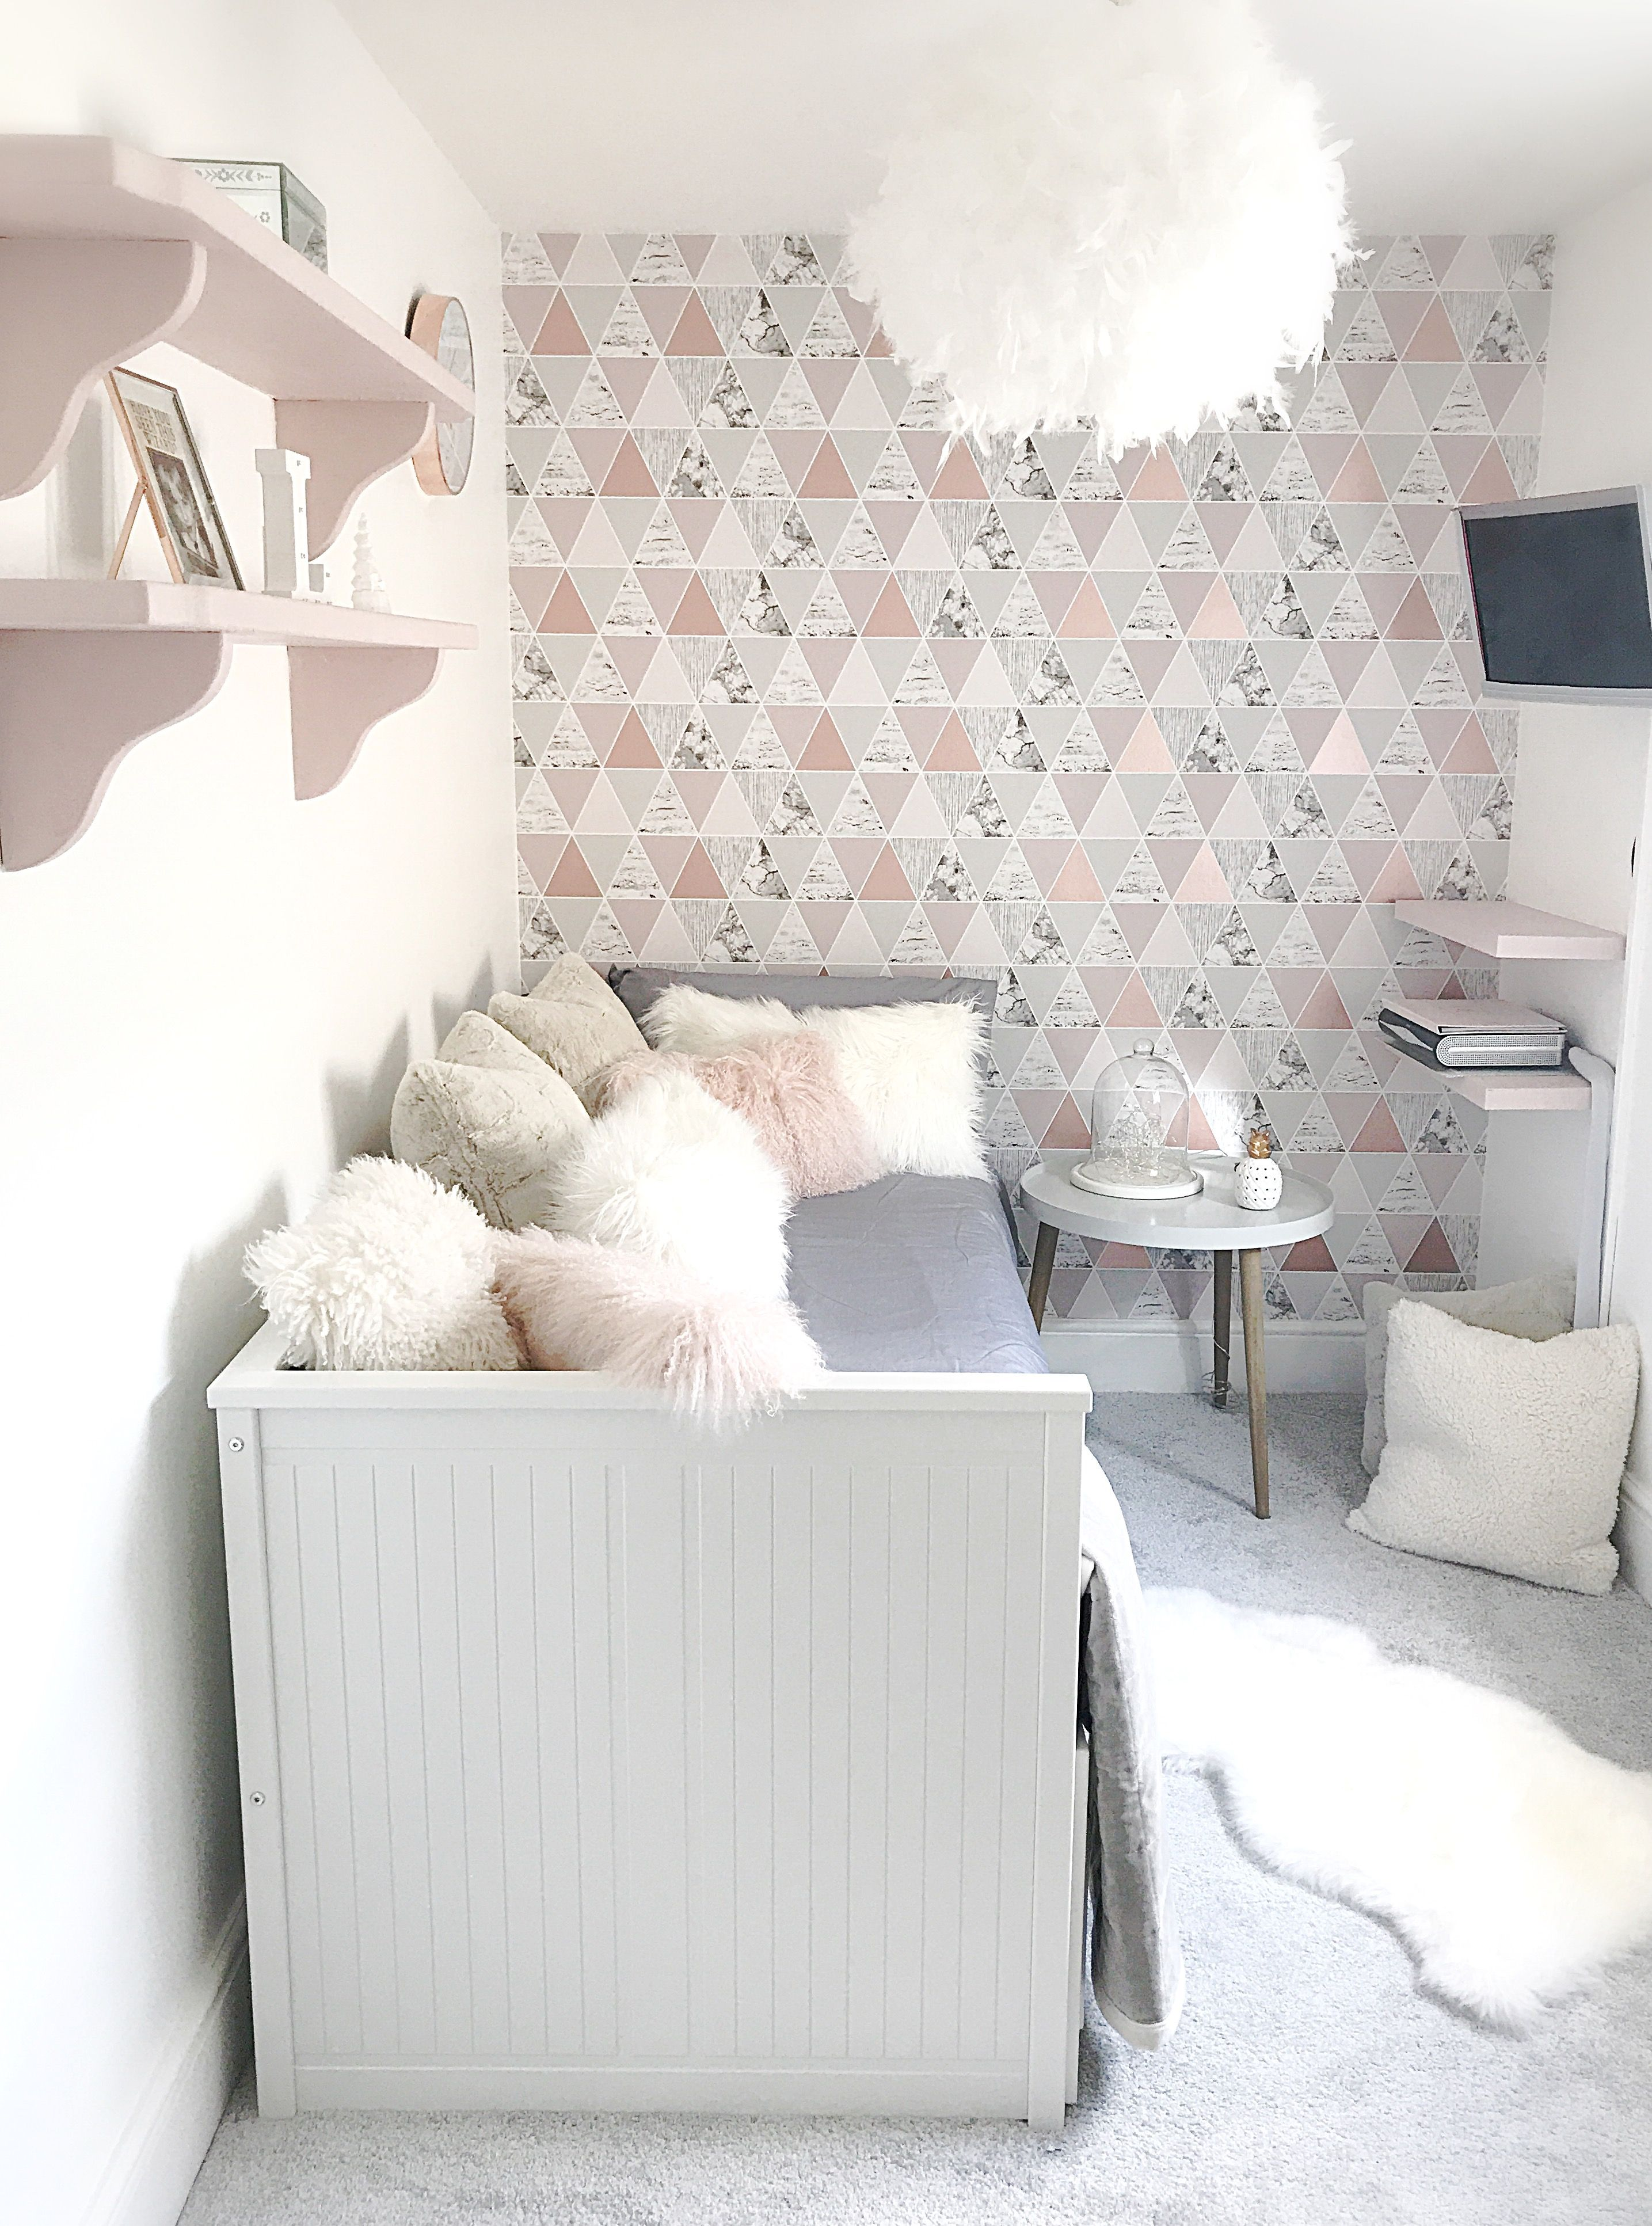 Rose Gold Pusheen Bedrooms 2870x3867 Wallpaper Teahub Io